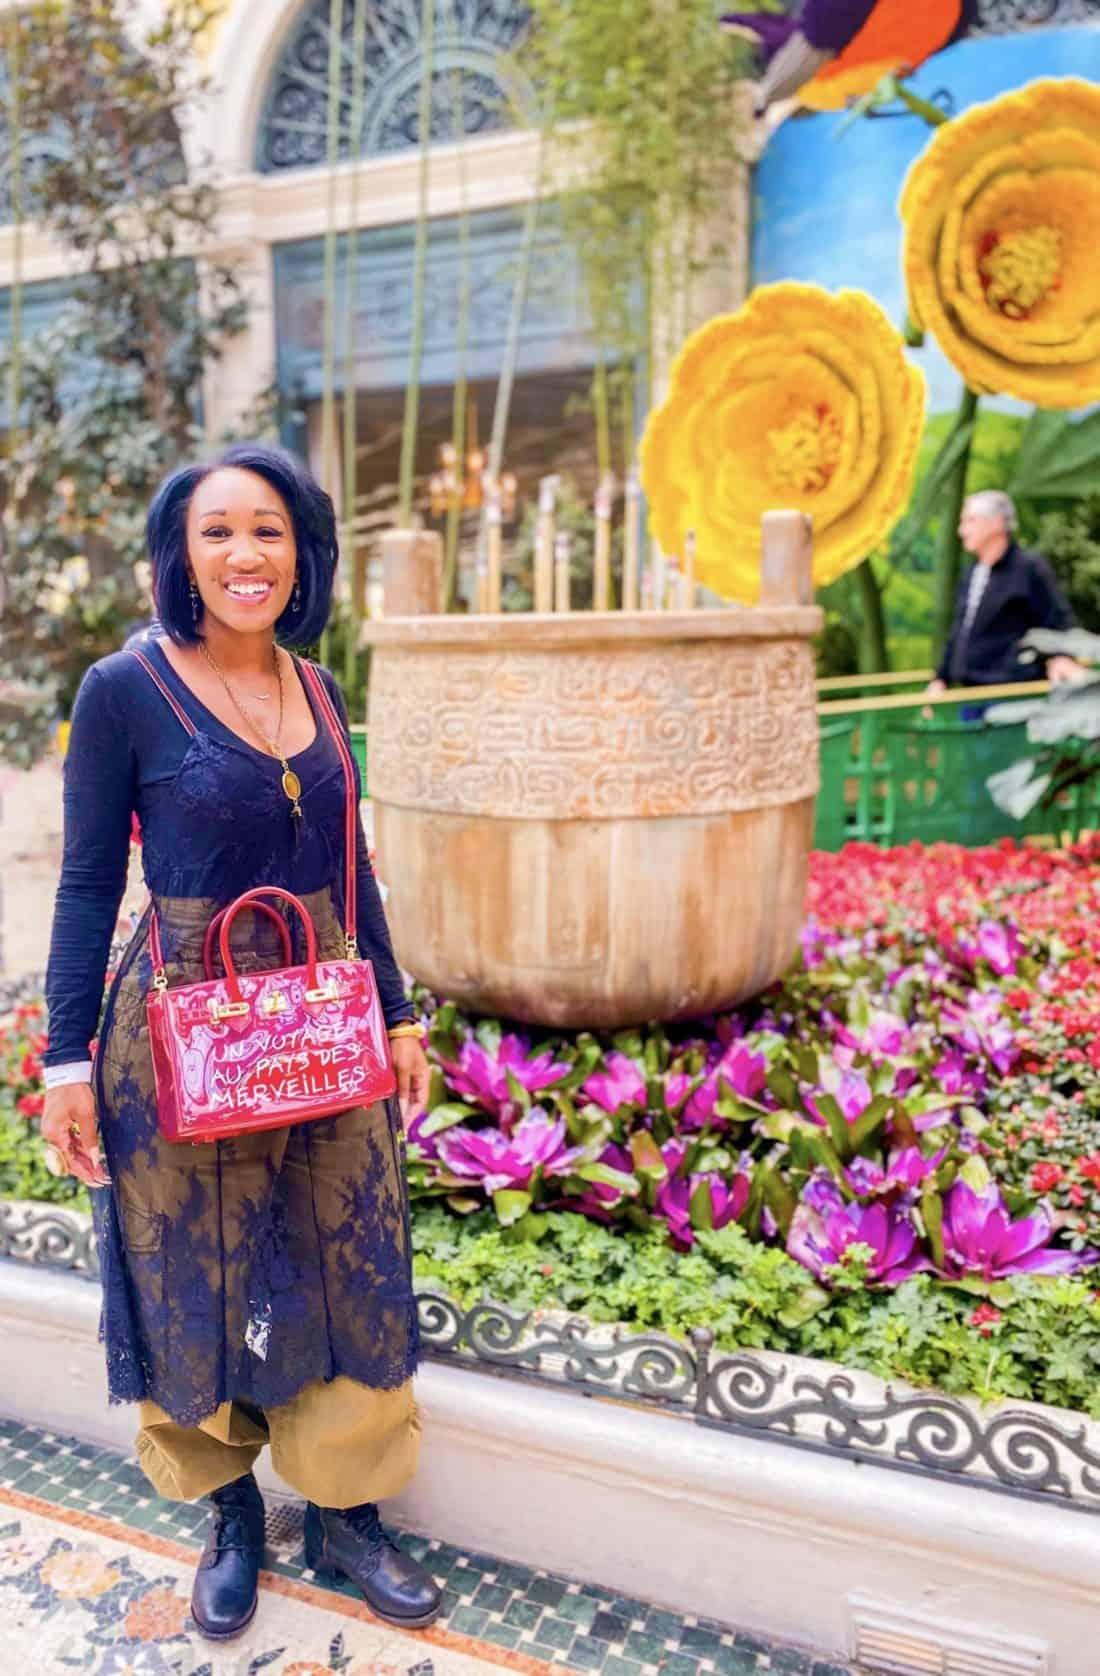 Las Vegas Speaker - My Drake Story & Why Words Matter